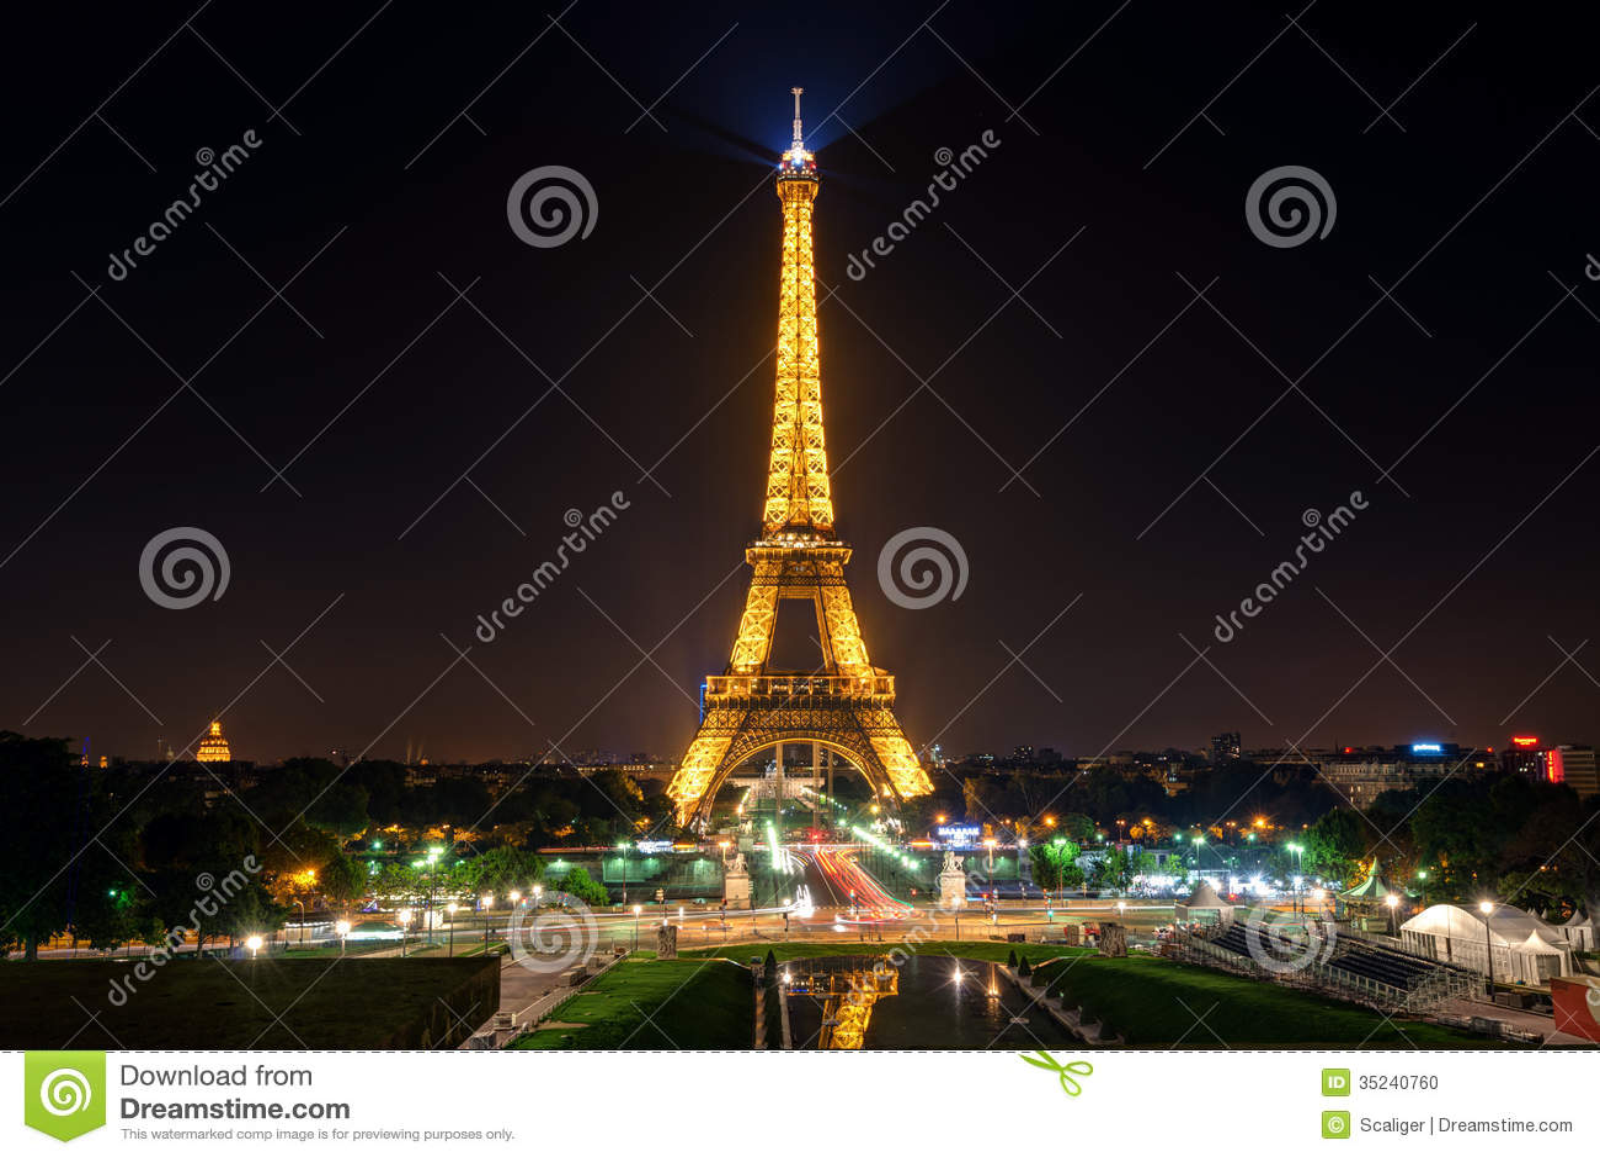 Fajarv Paris At Night Attractions